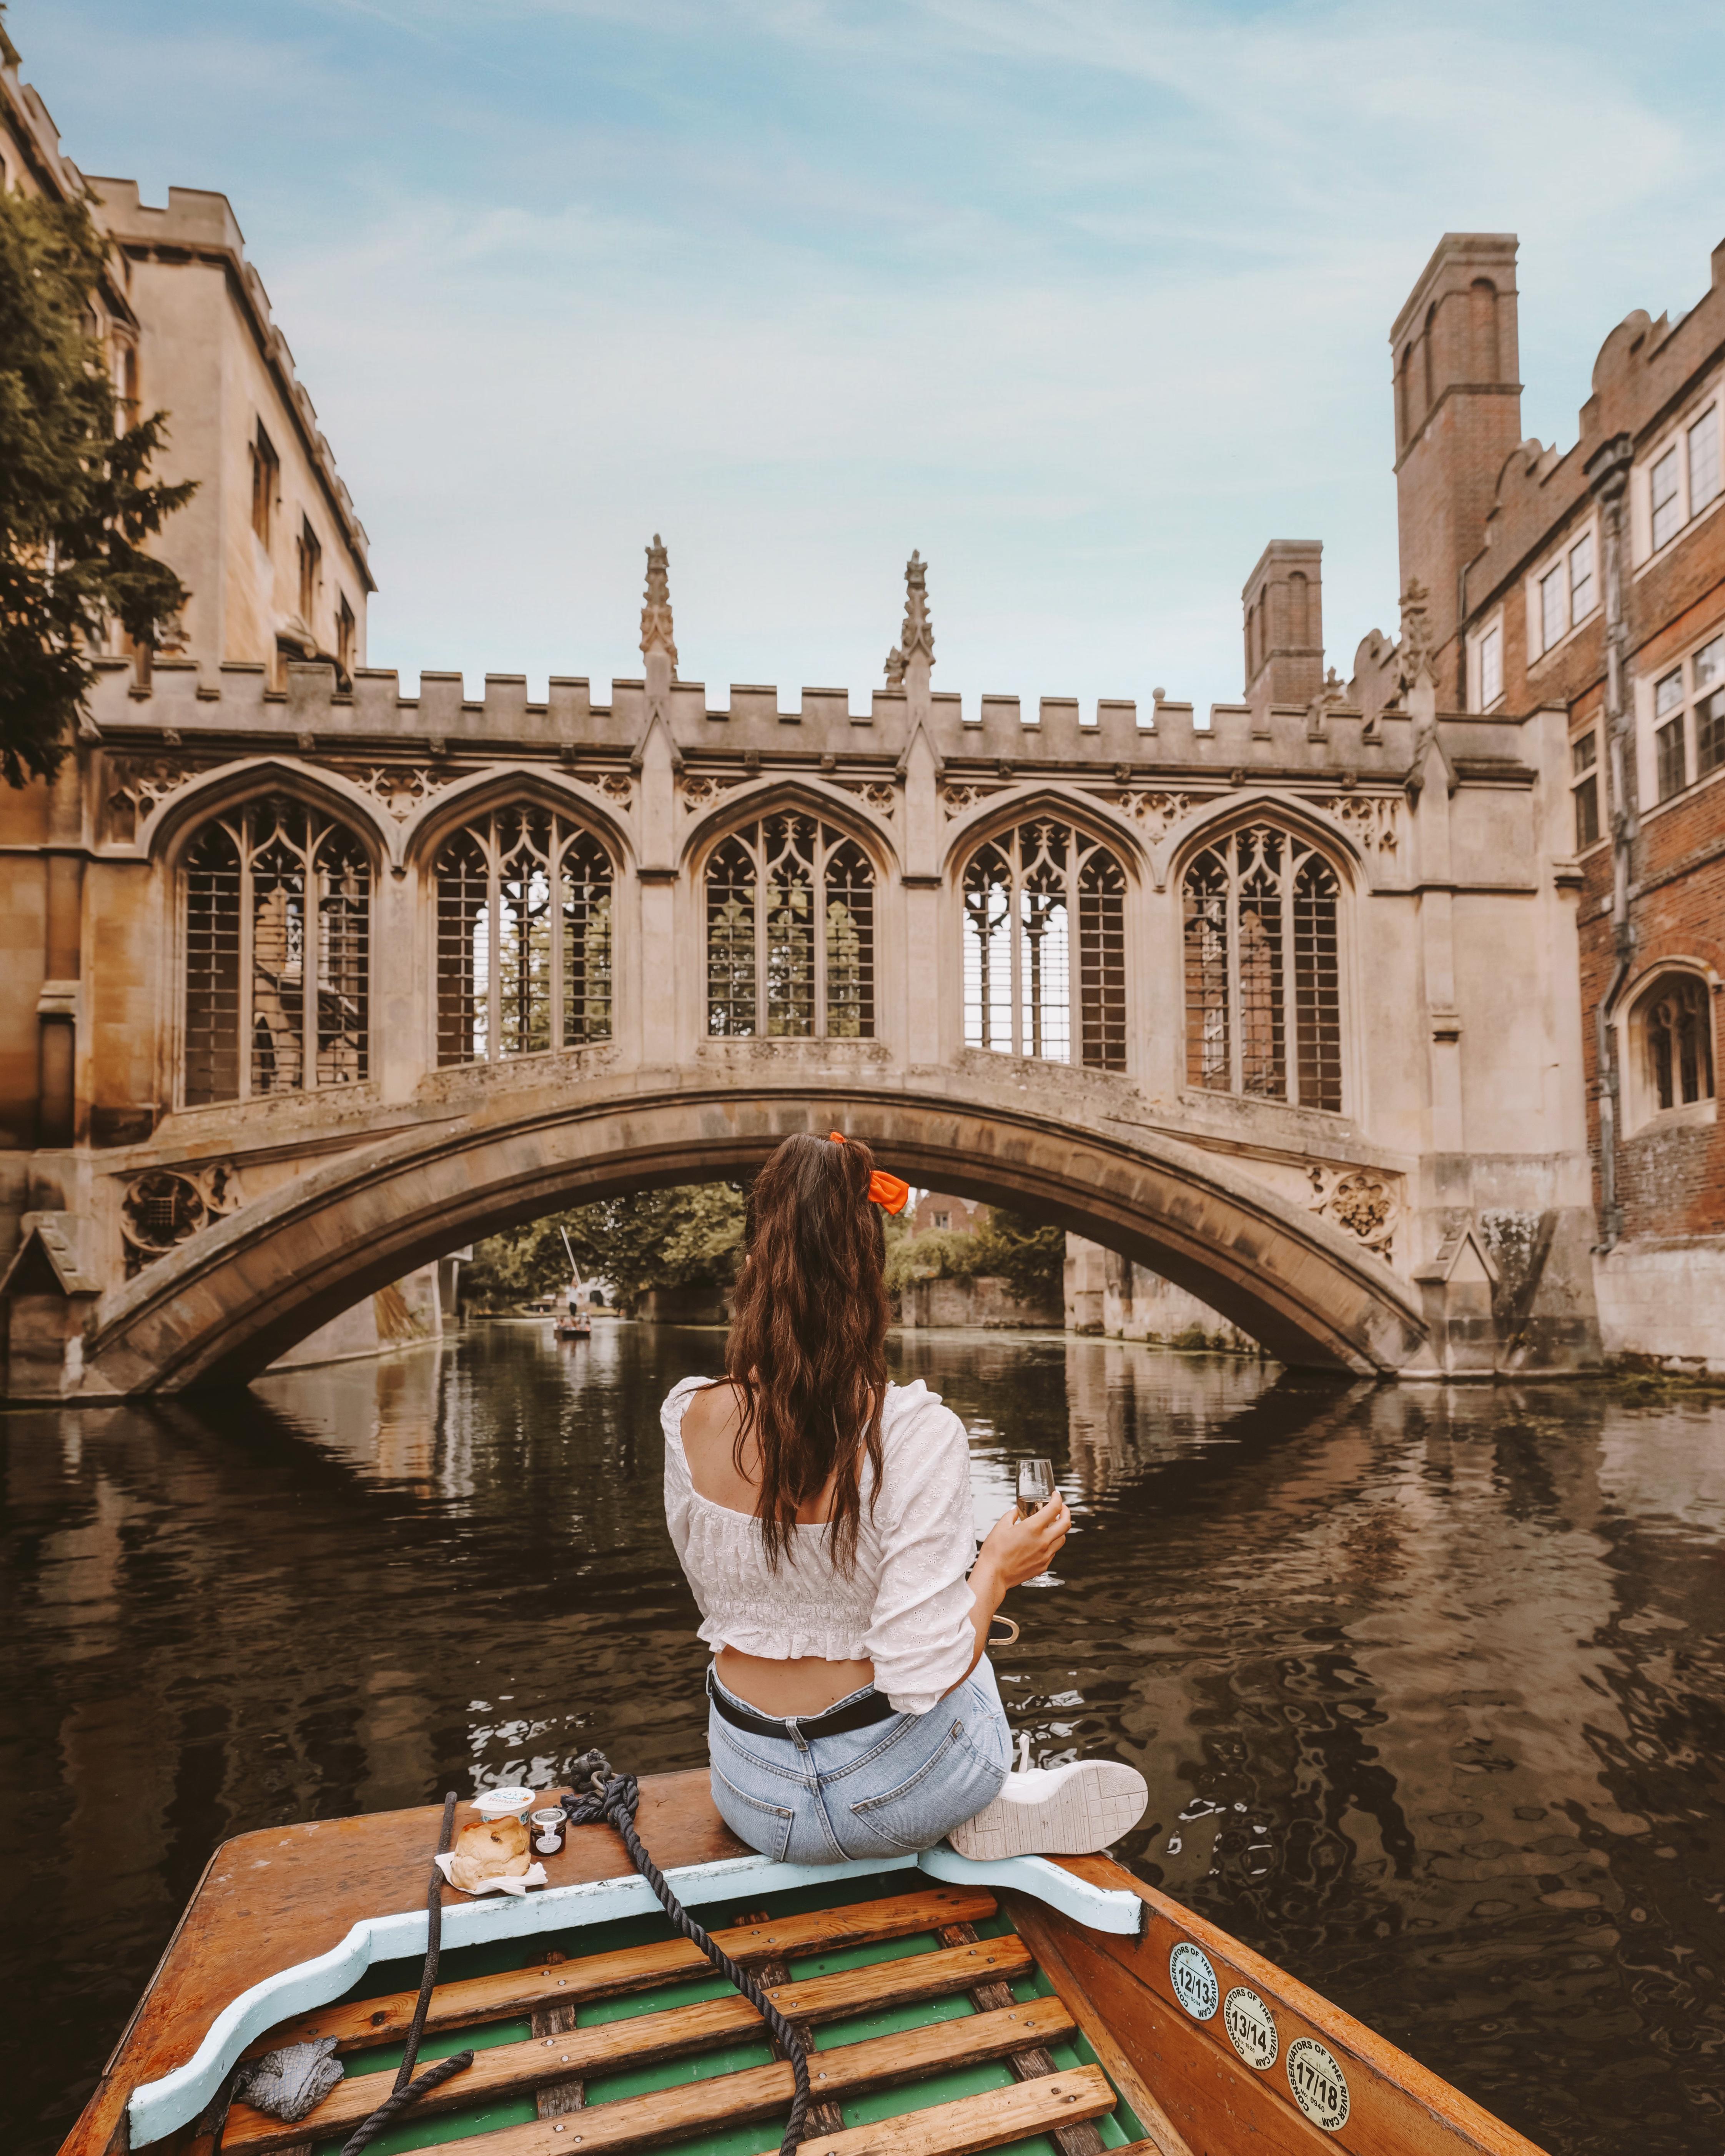 Punting-in-Cambridge